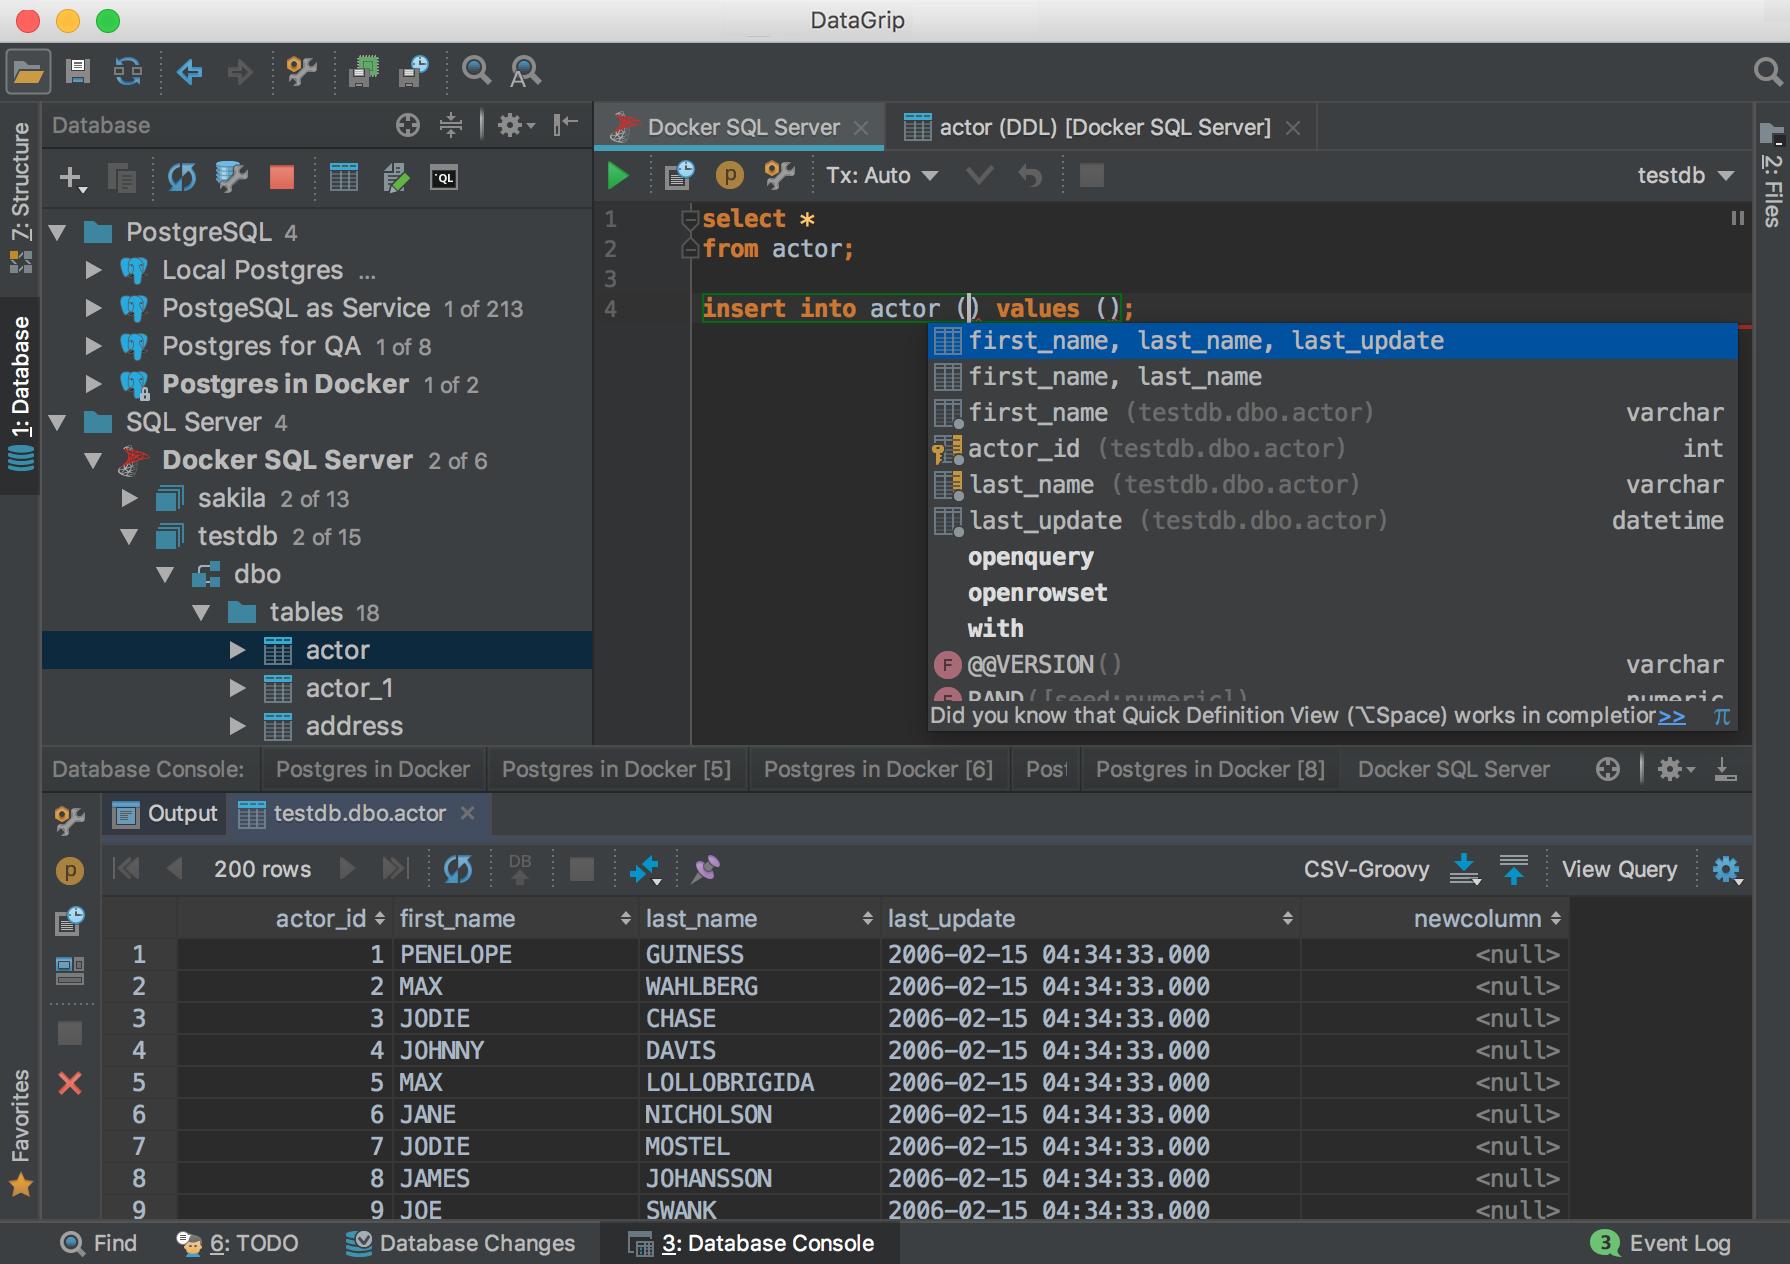 PostgreSQL: What are some good alternatives to pgAdmin3? - Quora